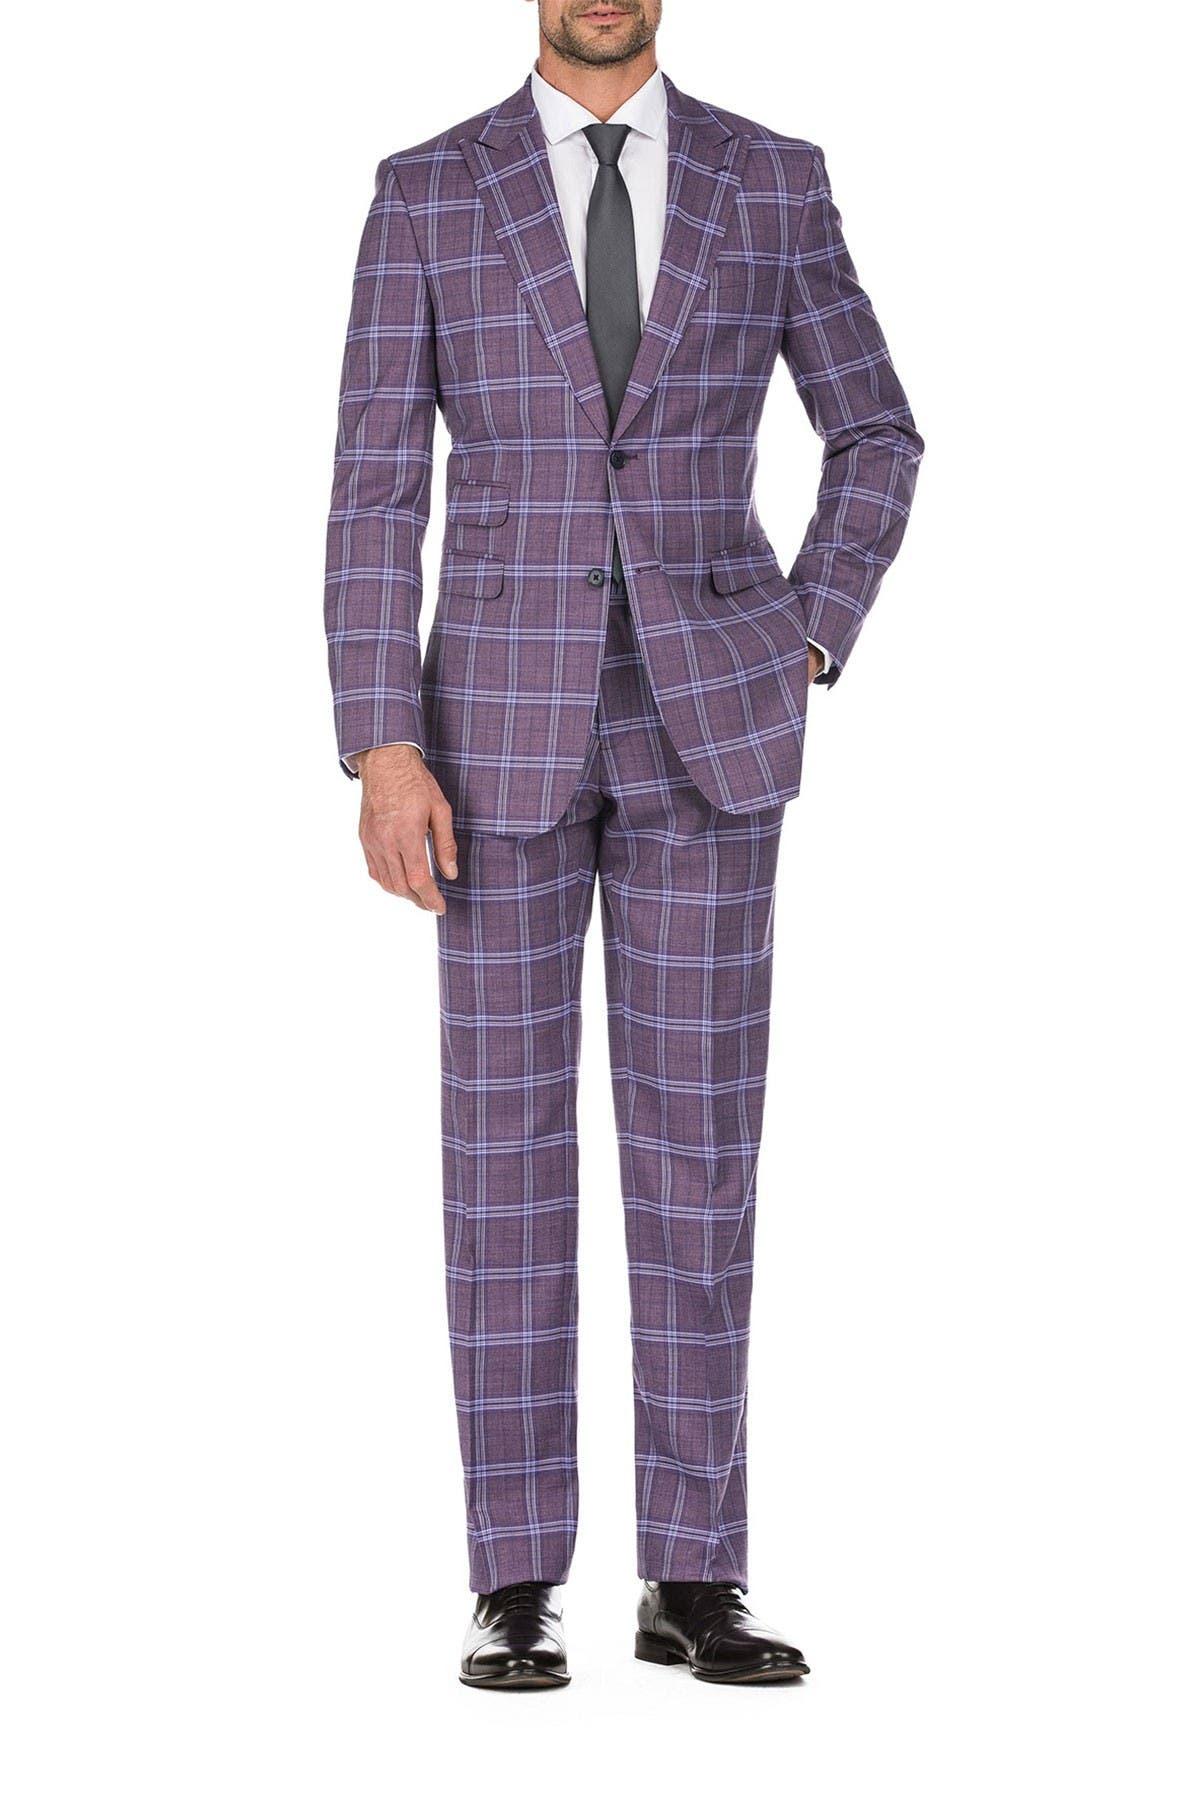 Image of English Laundry Burgundy Plaid Slim Fit Peak Lapel Suit